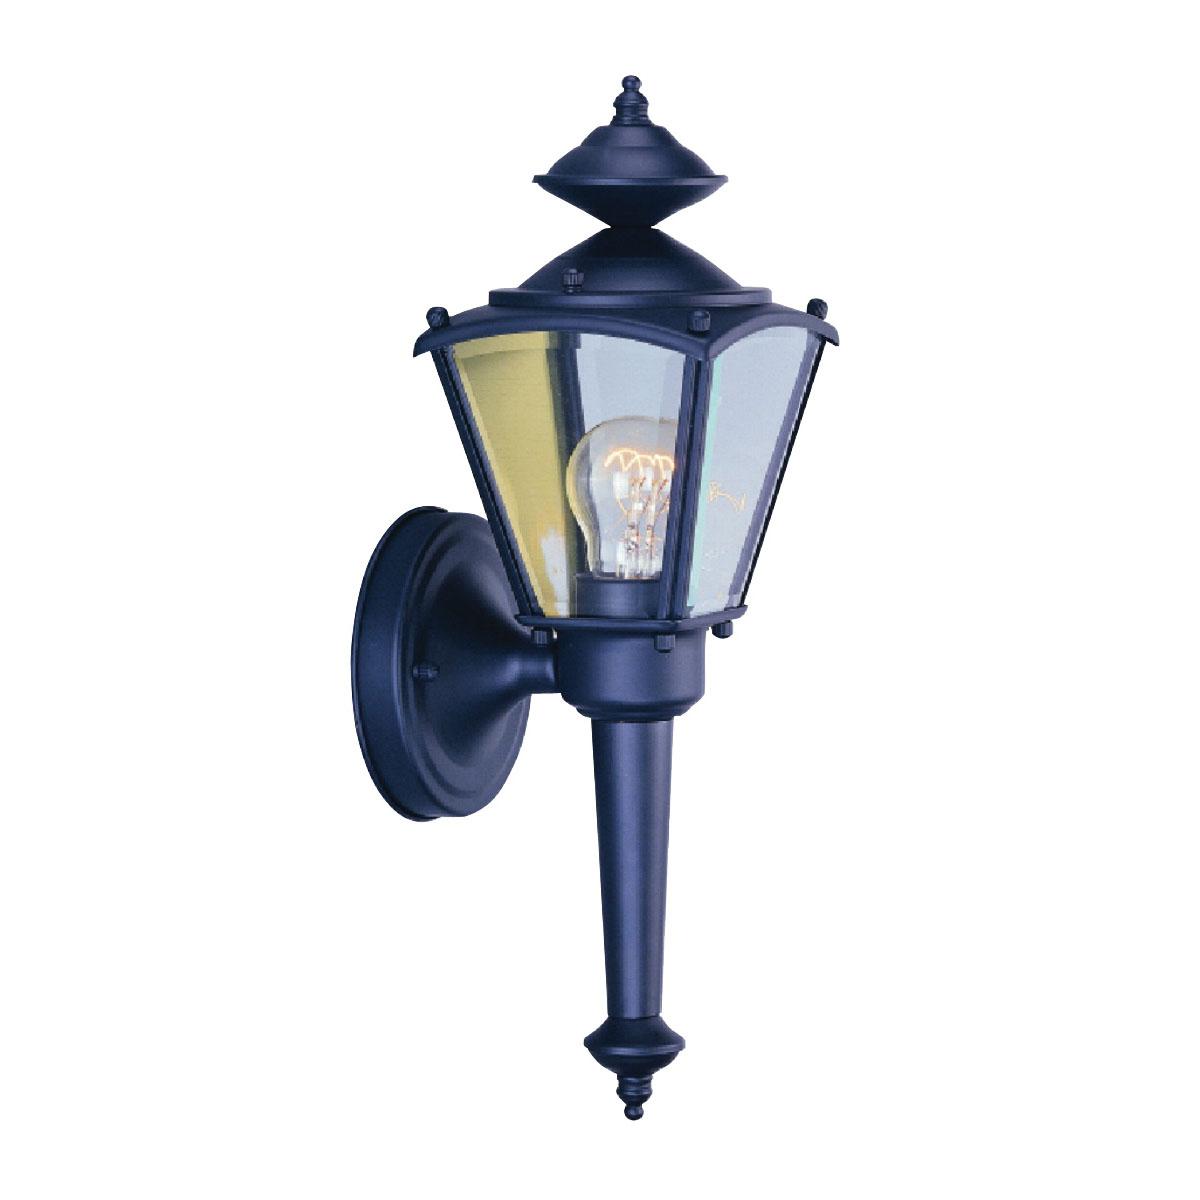 Picture of Boston Harbor 4003H-53L Porch Light Fixture, CFL Lamp, Black